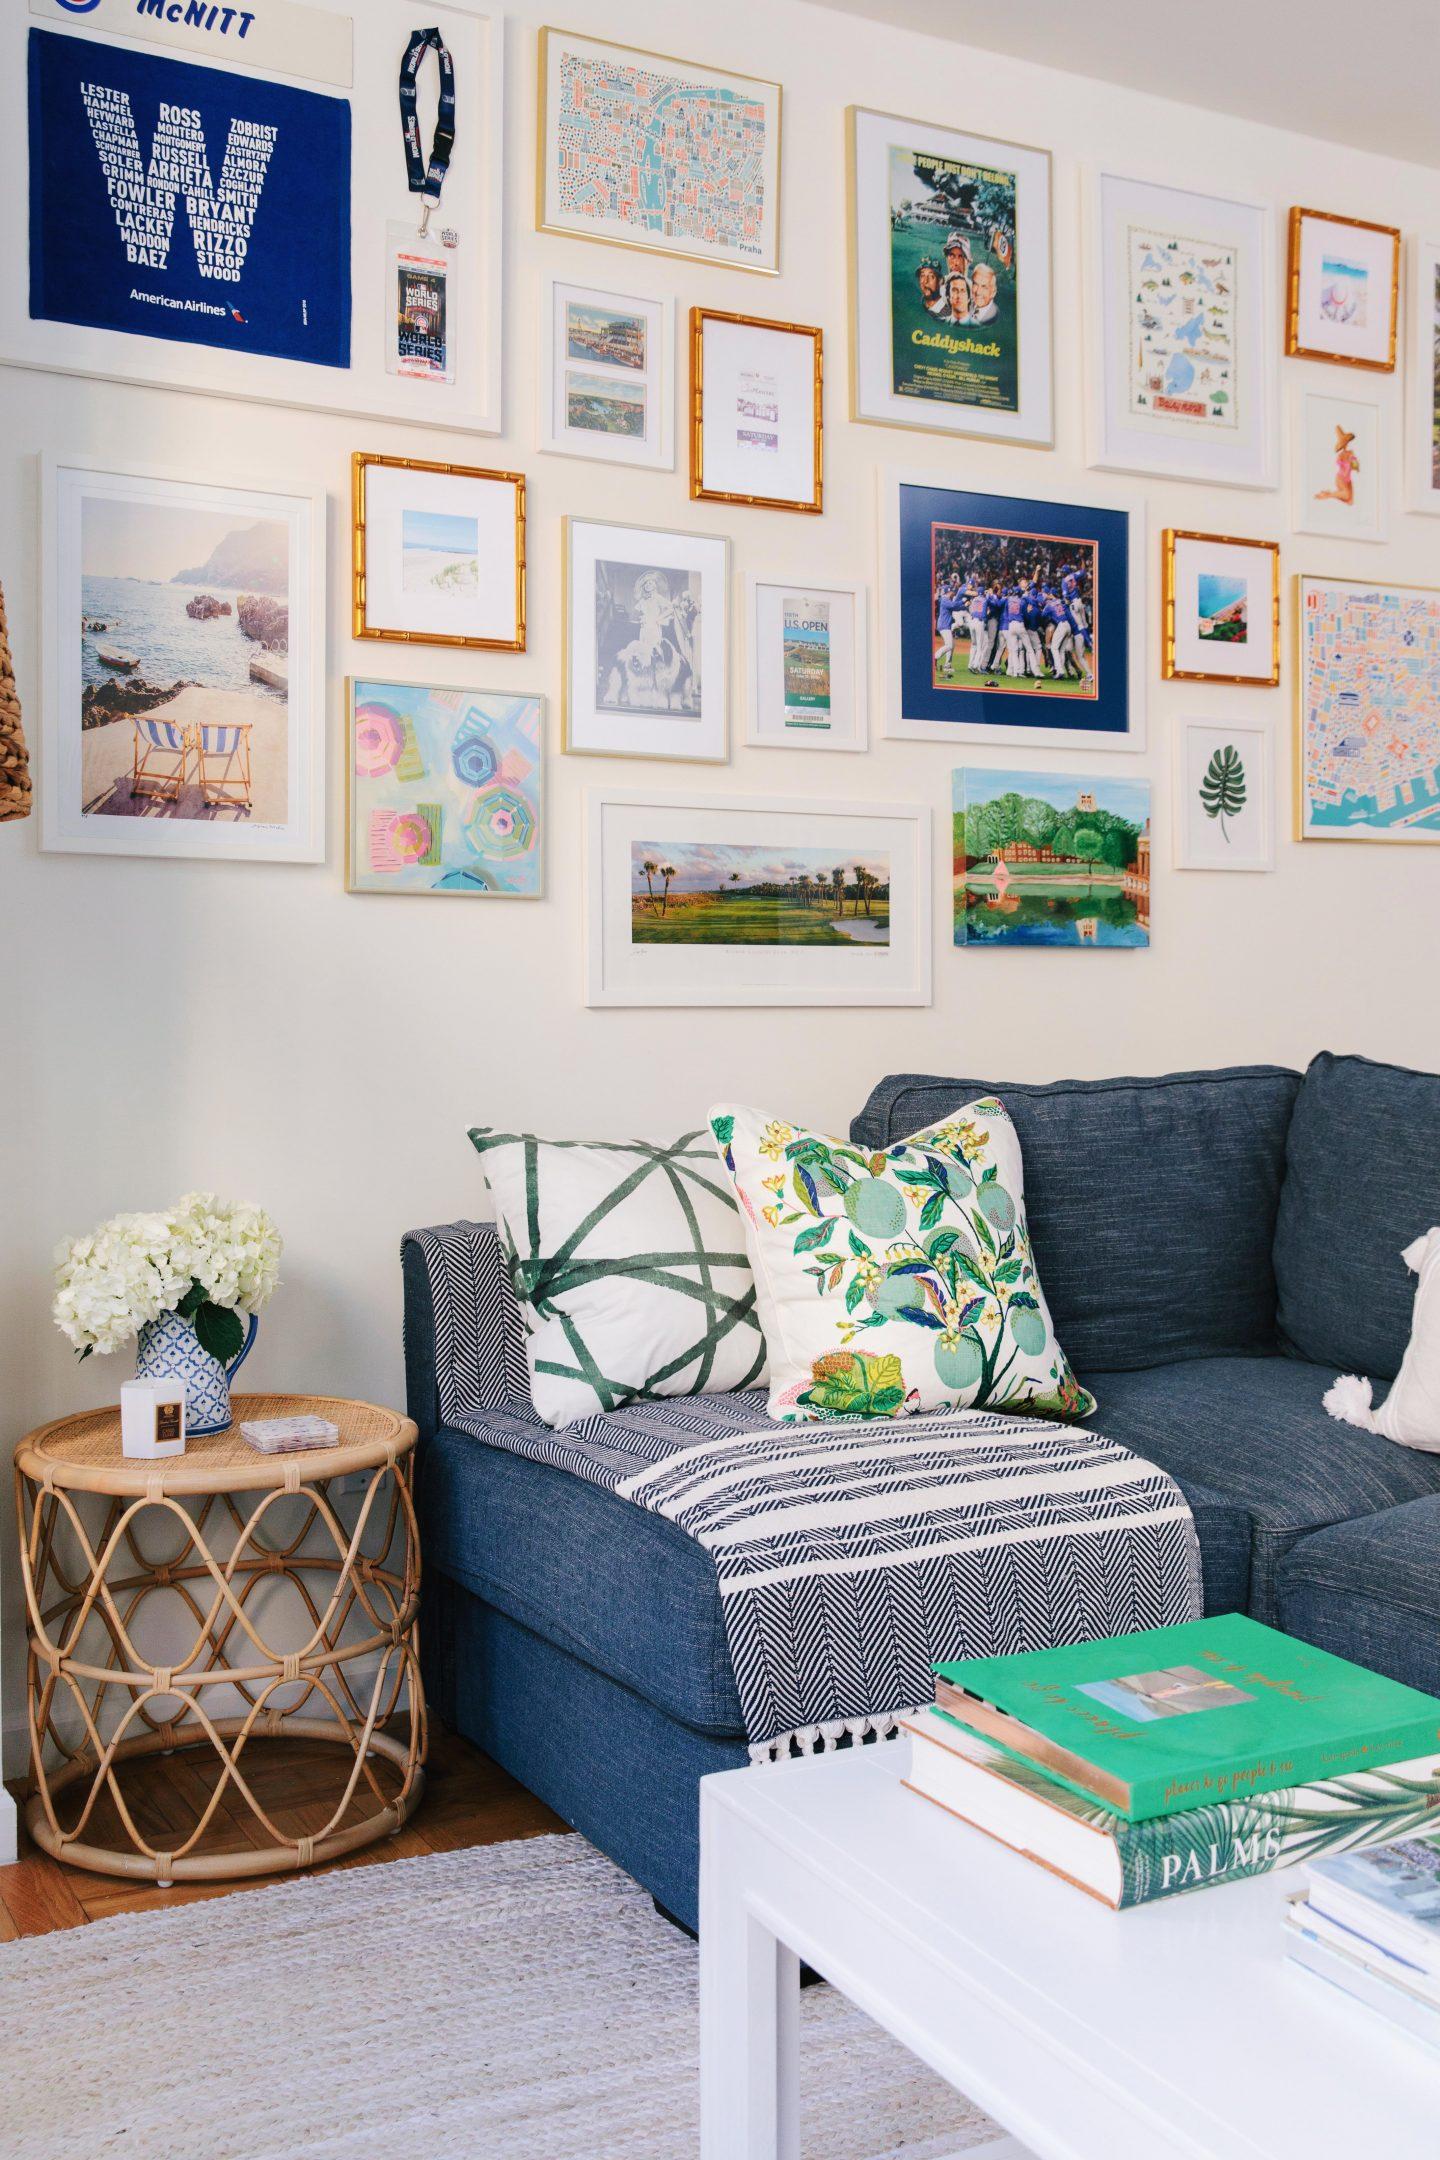 Living Room Tour Apt2B with Lovesac and Apt2B